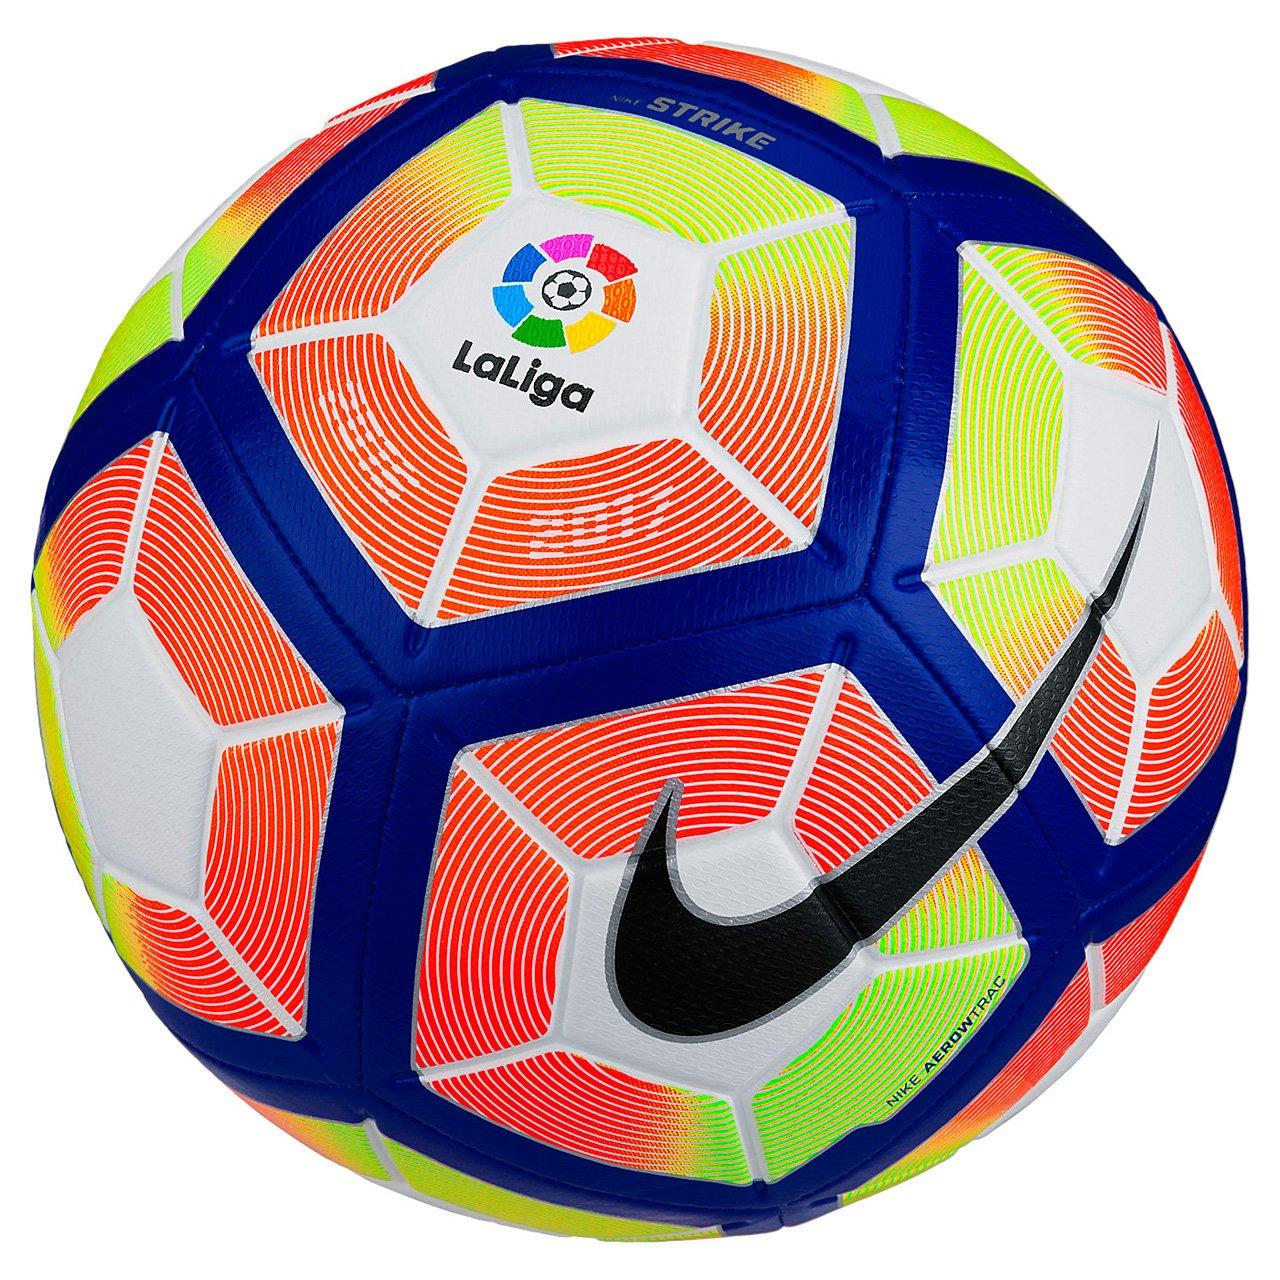 Balón de fútbol Nike de La Liga por solo 22,65€